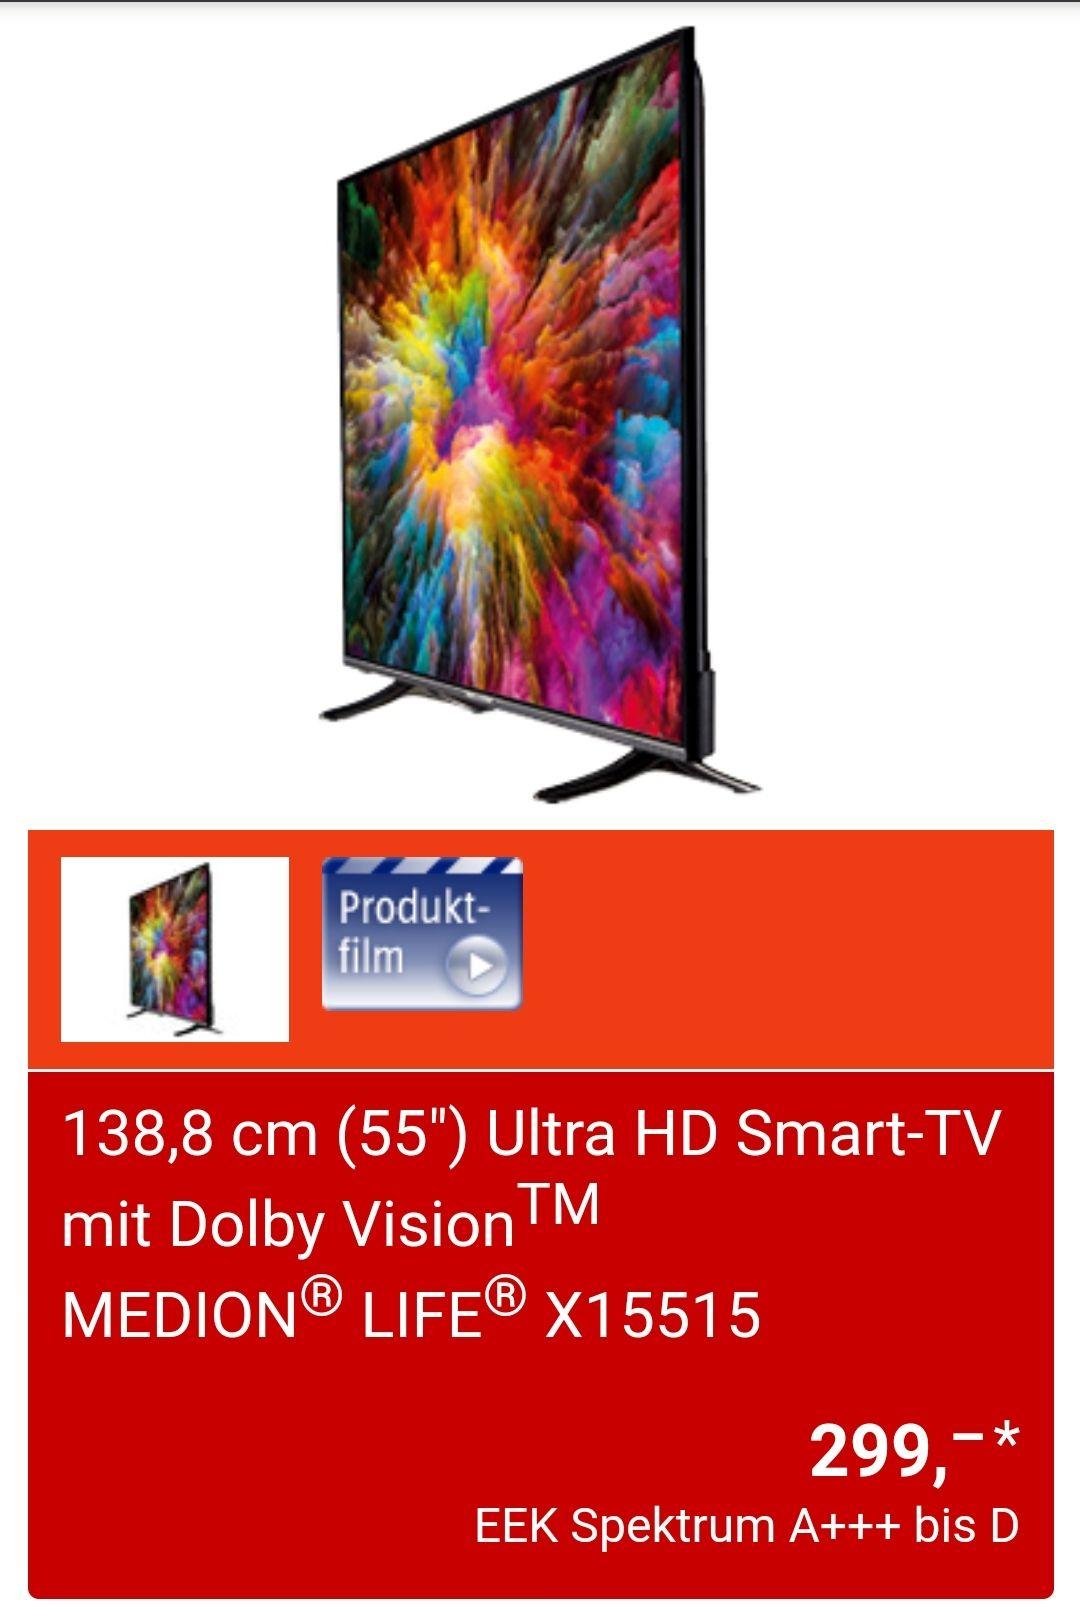 Grensdeal Aldi Duitsland Medion Life X15515 55inch Uhd TV